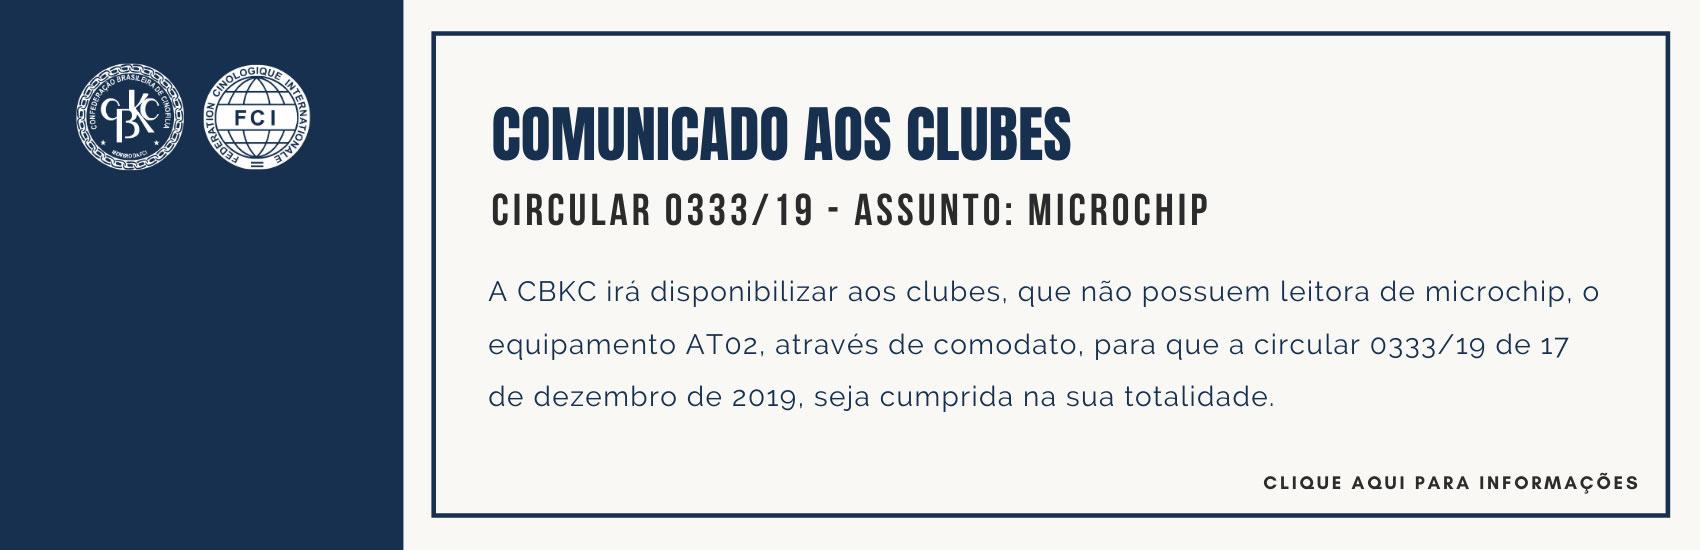 CBKC - Circular 334/19 - Microchip.